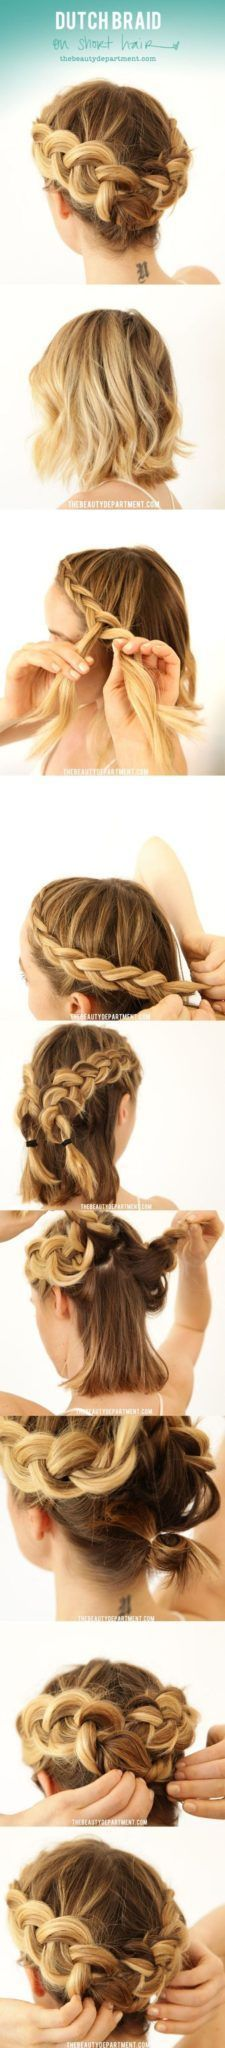 24 Easy hairstyles for short hair + Tutorial